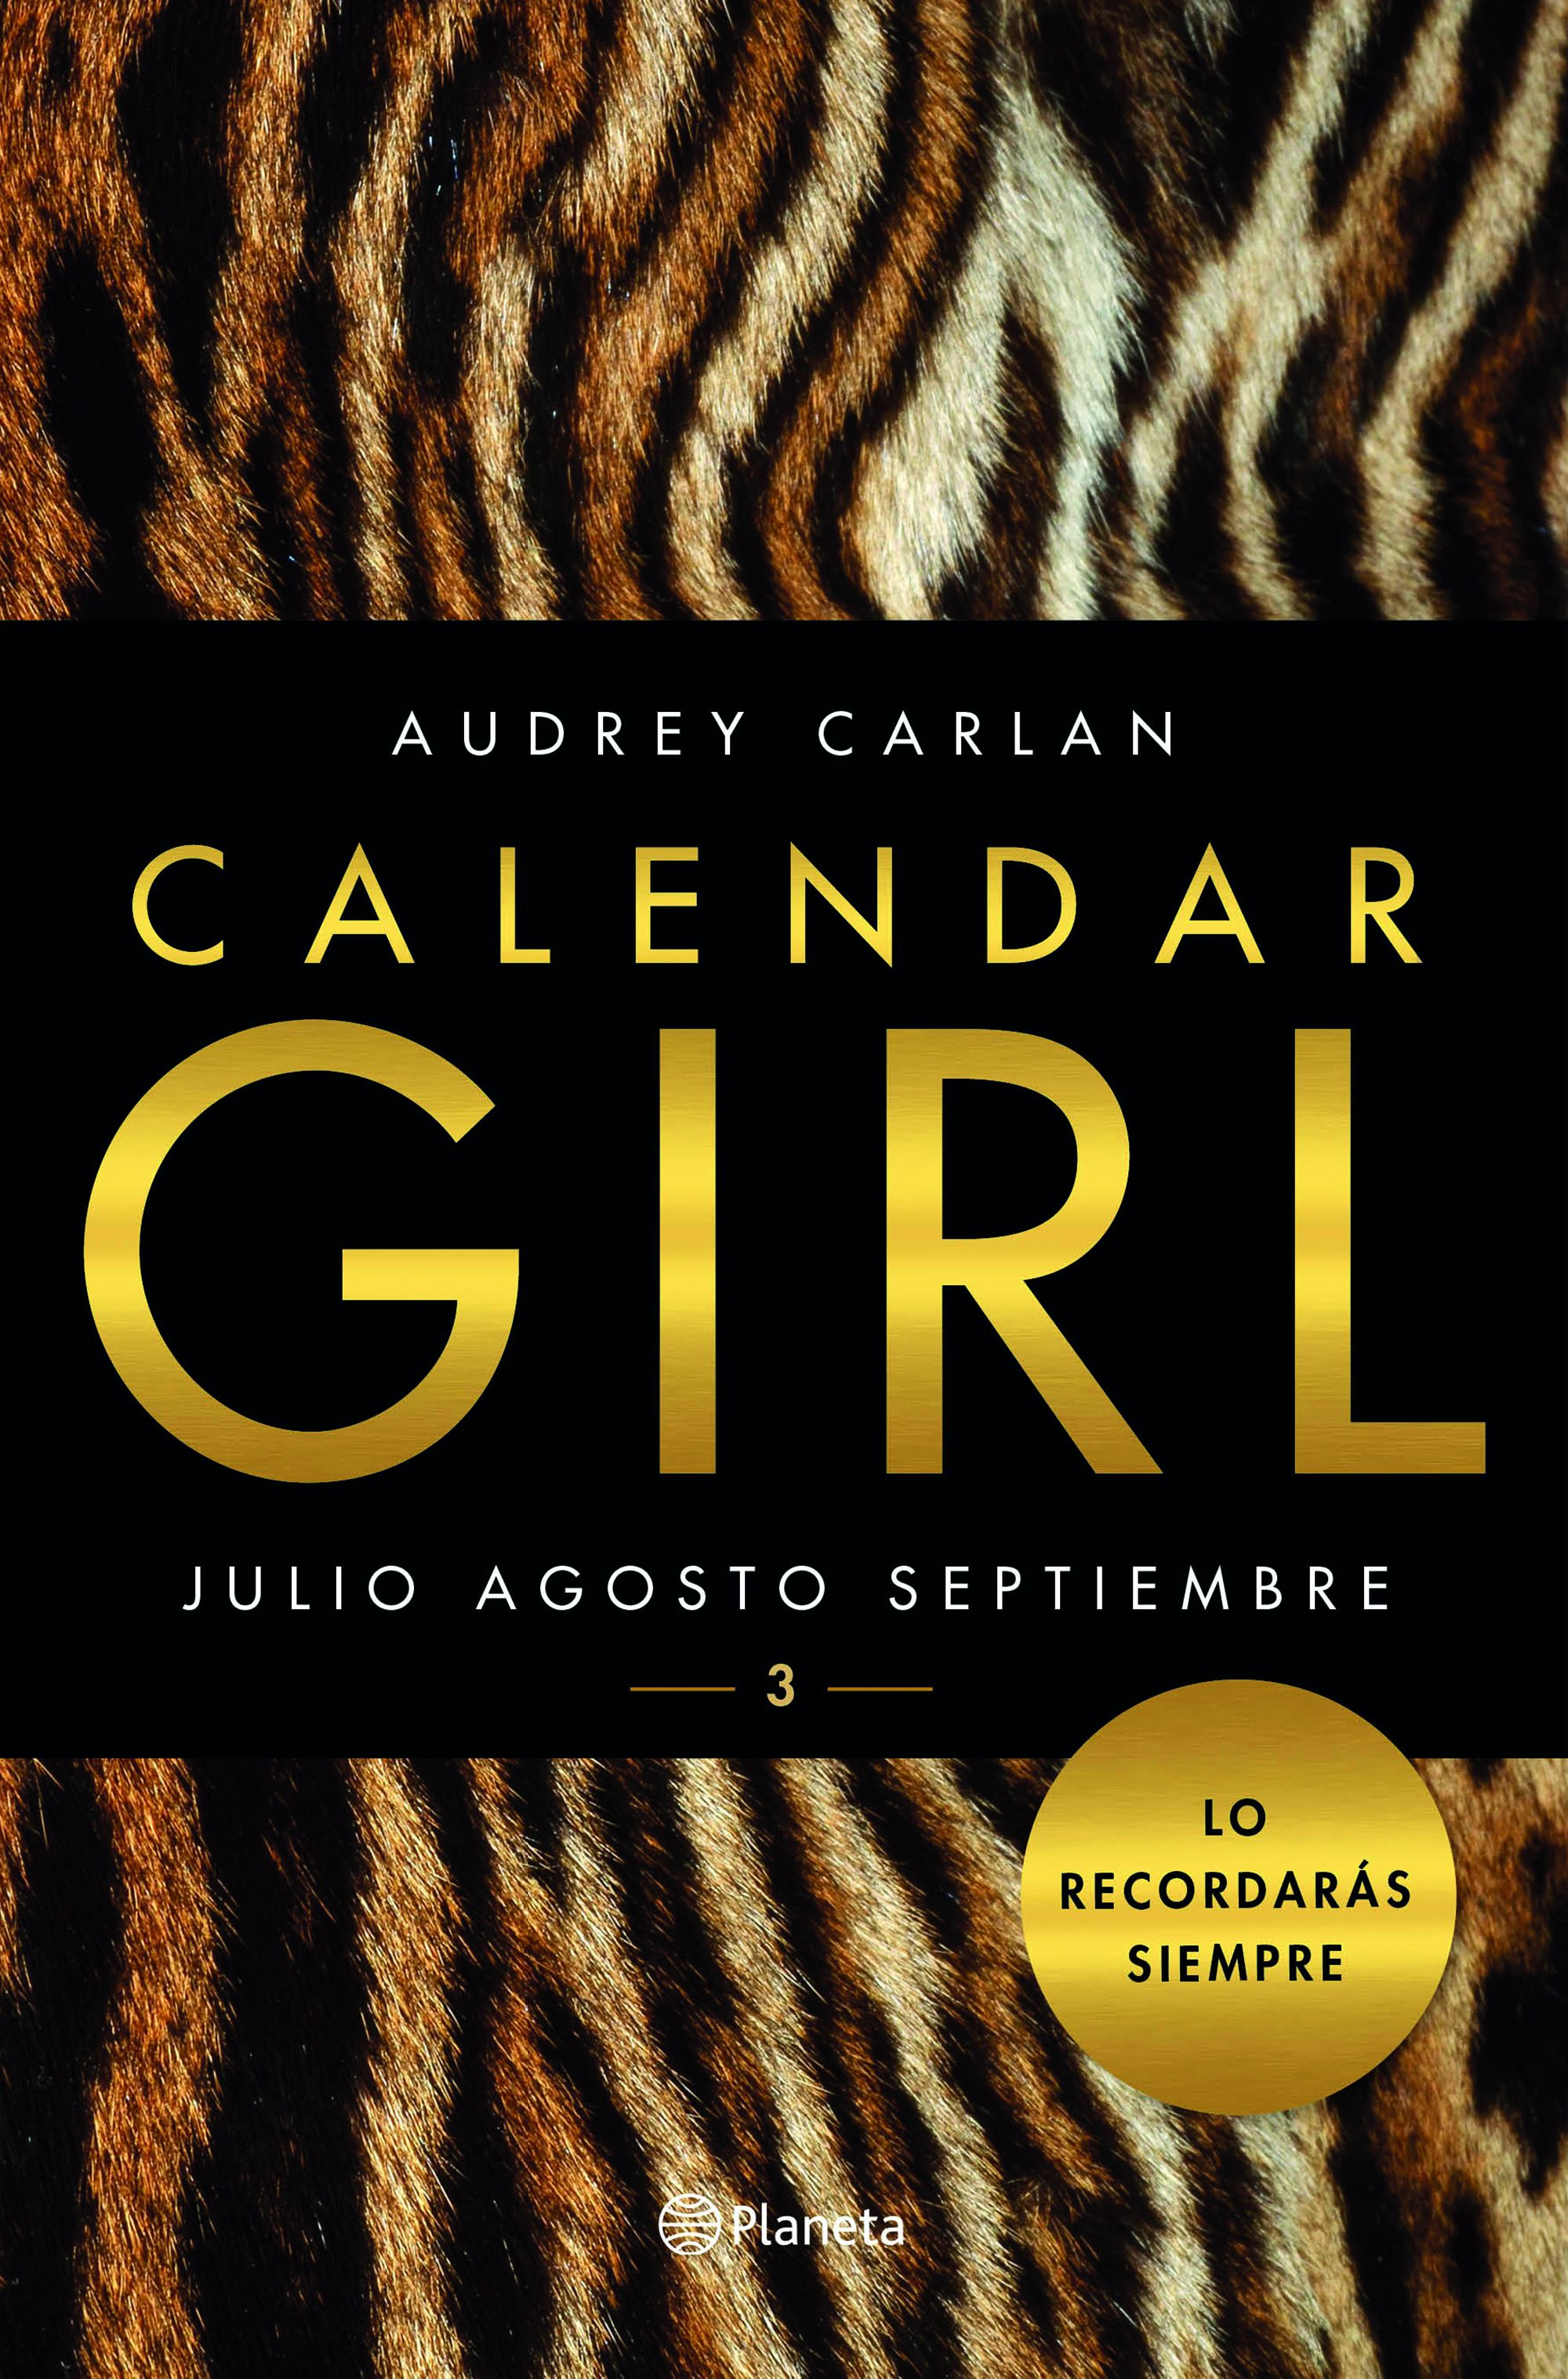 http://static9.planetadelibros.com/usuaris/libros/fotos/217/original/portada_calendar-girl-3_audrey-carlan_201605251015.jpg?_ga=1.173195107.1391328160.1459162241